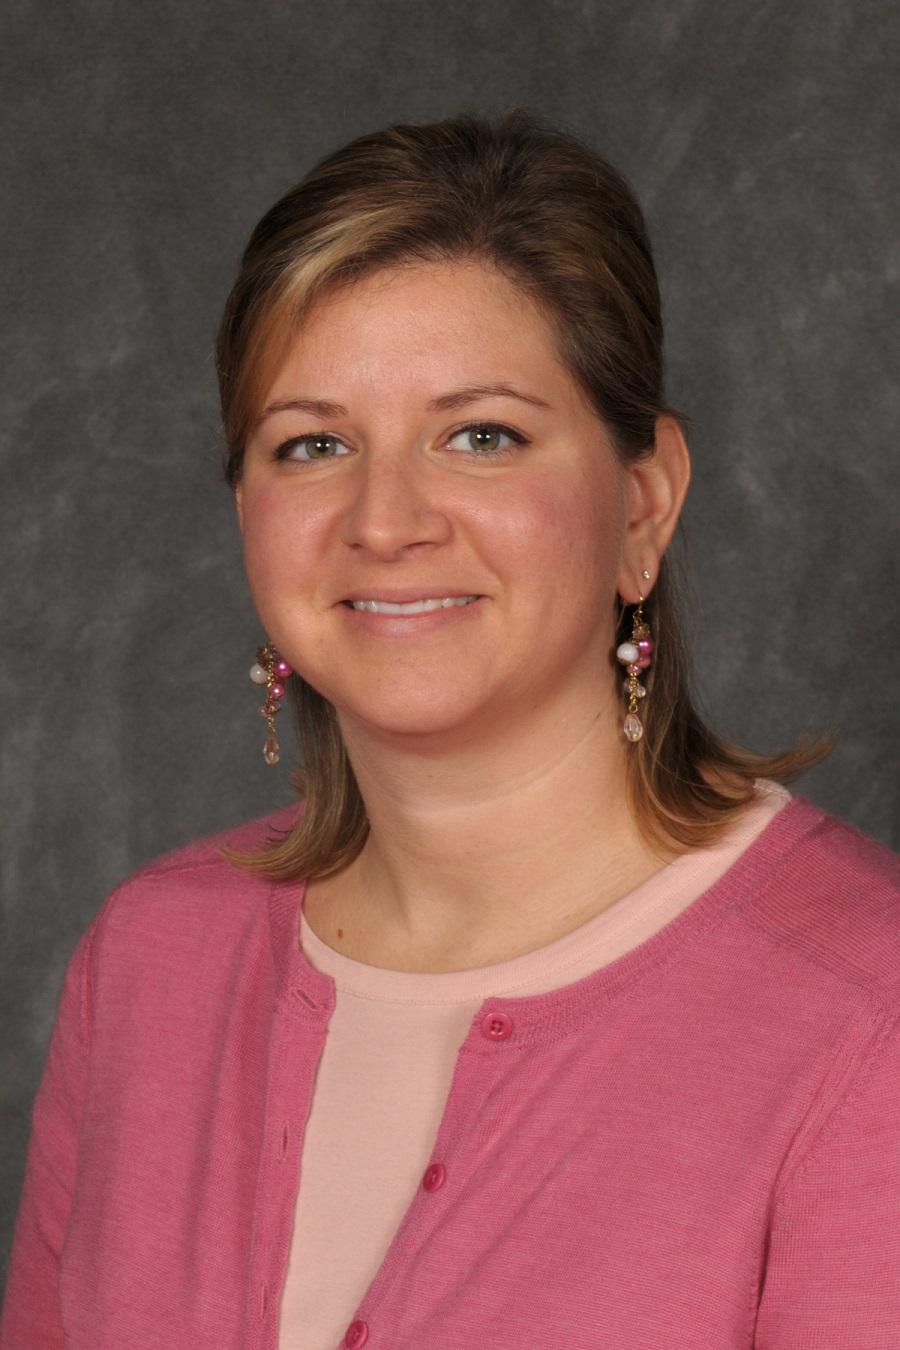 Christy Beneri